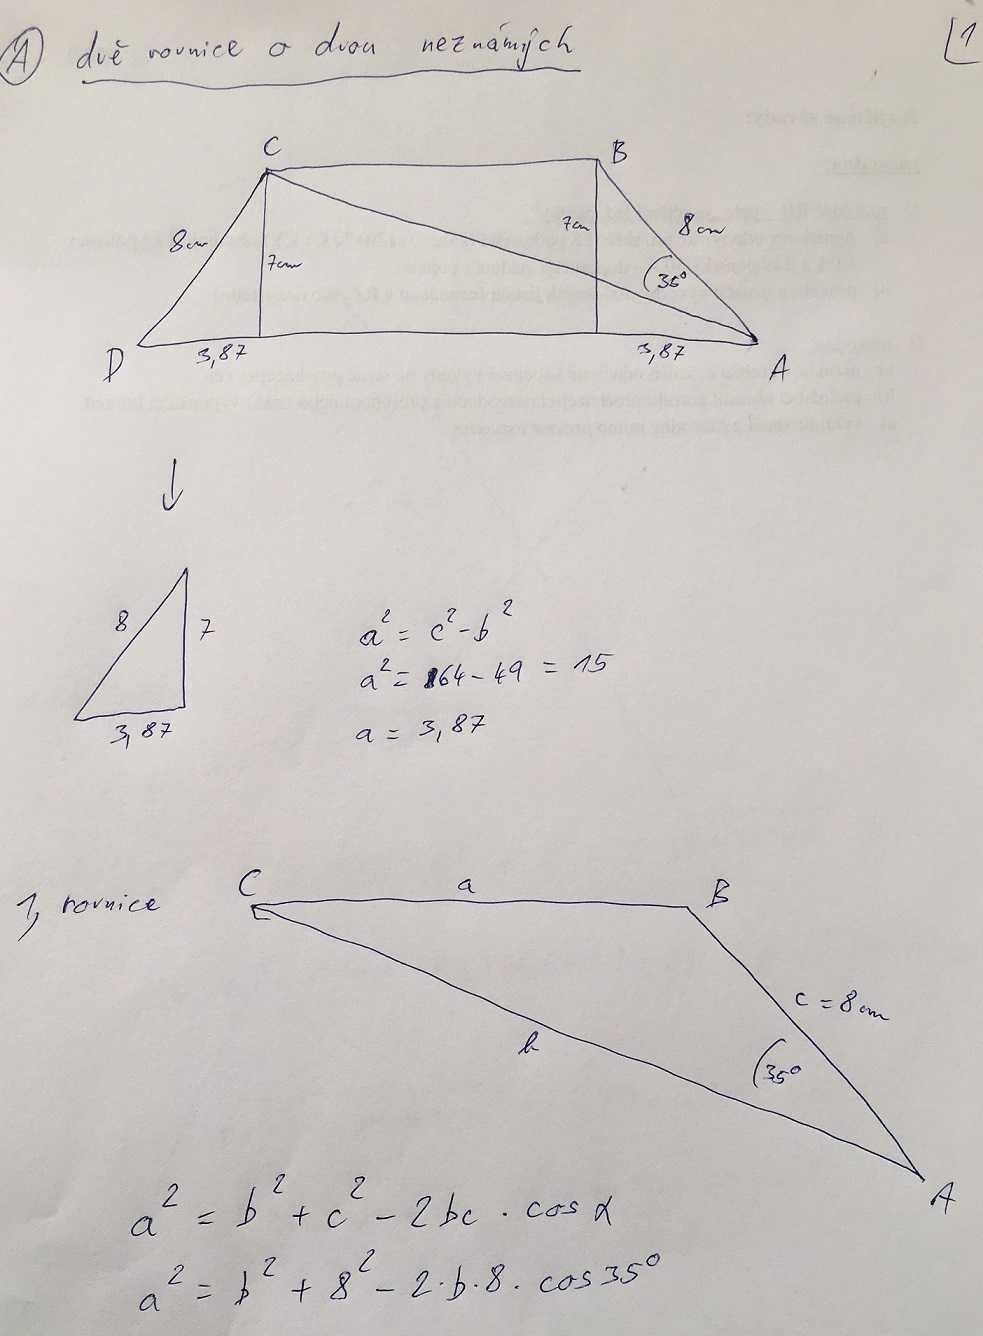 http://forum.matematika.cz/upload3/img/2017-08/85237_%25281%2529.JPG